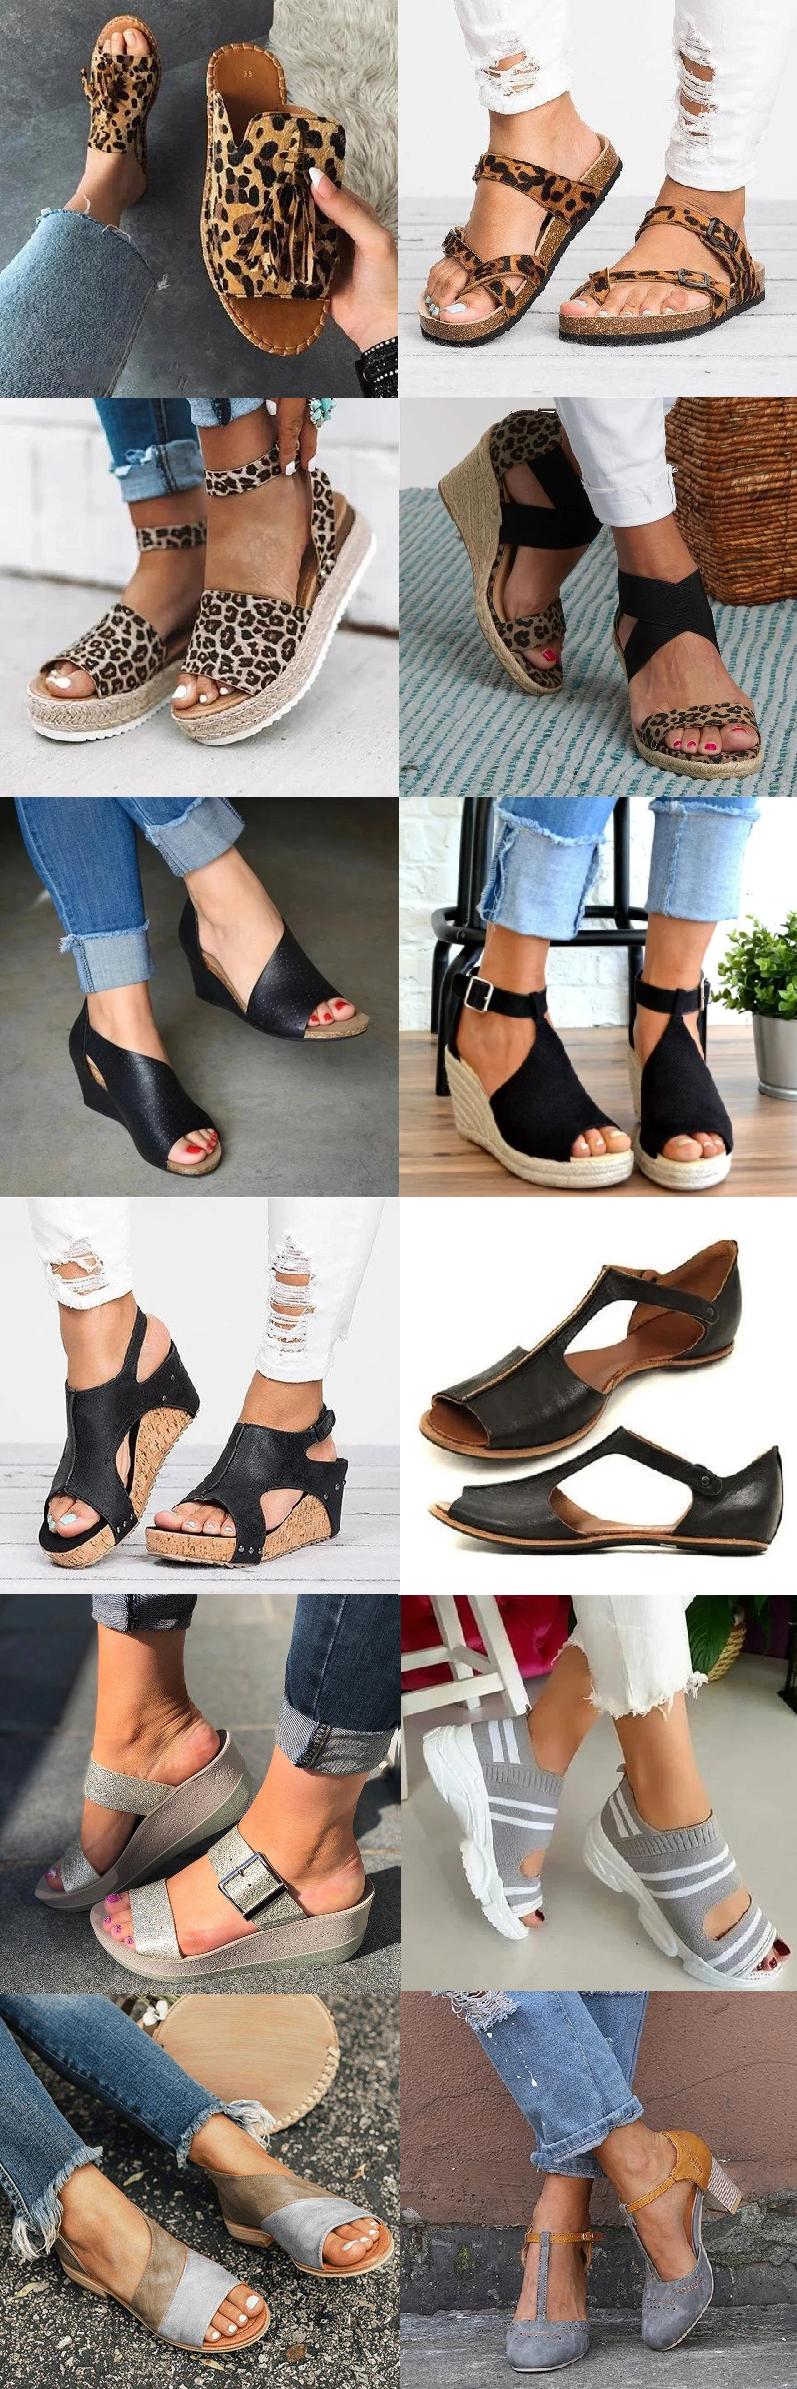 Find 2020 Best Heel Sandals,Slippers